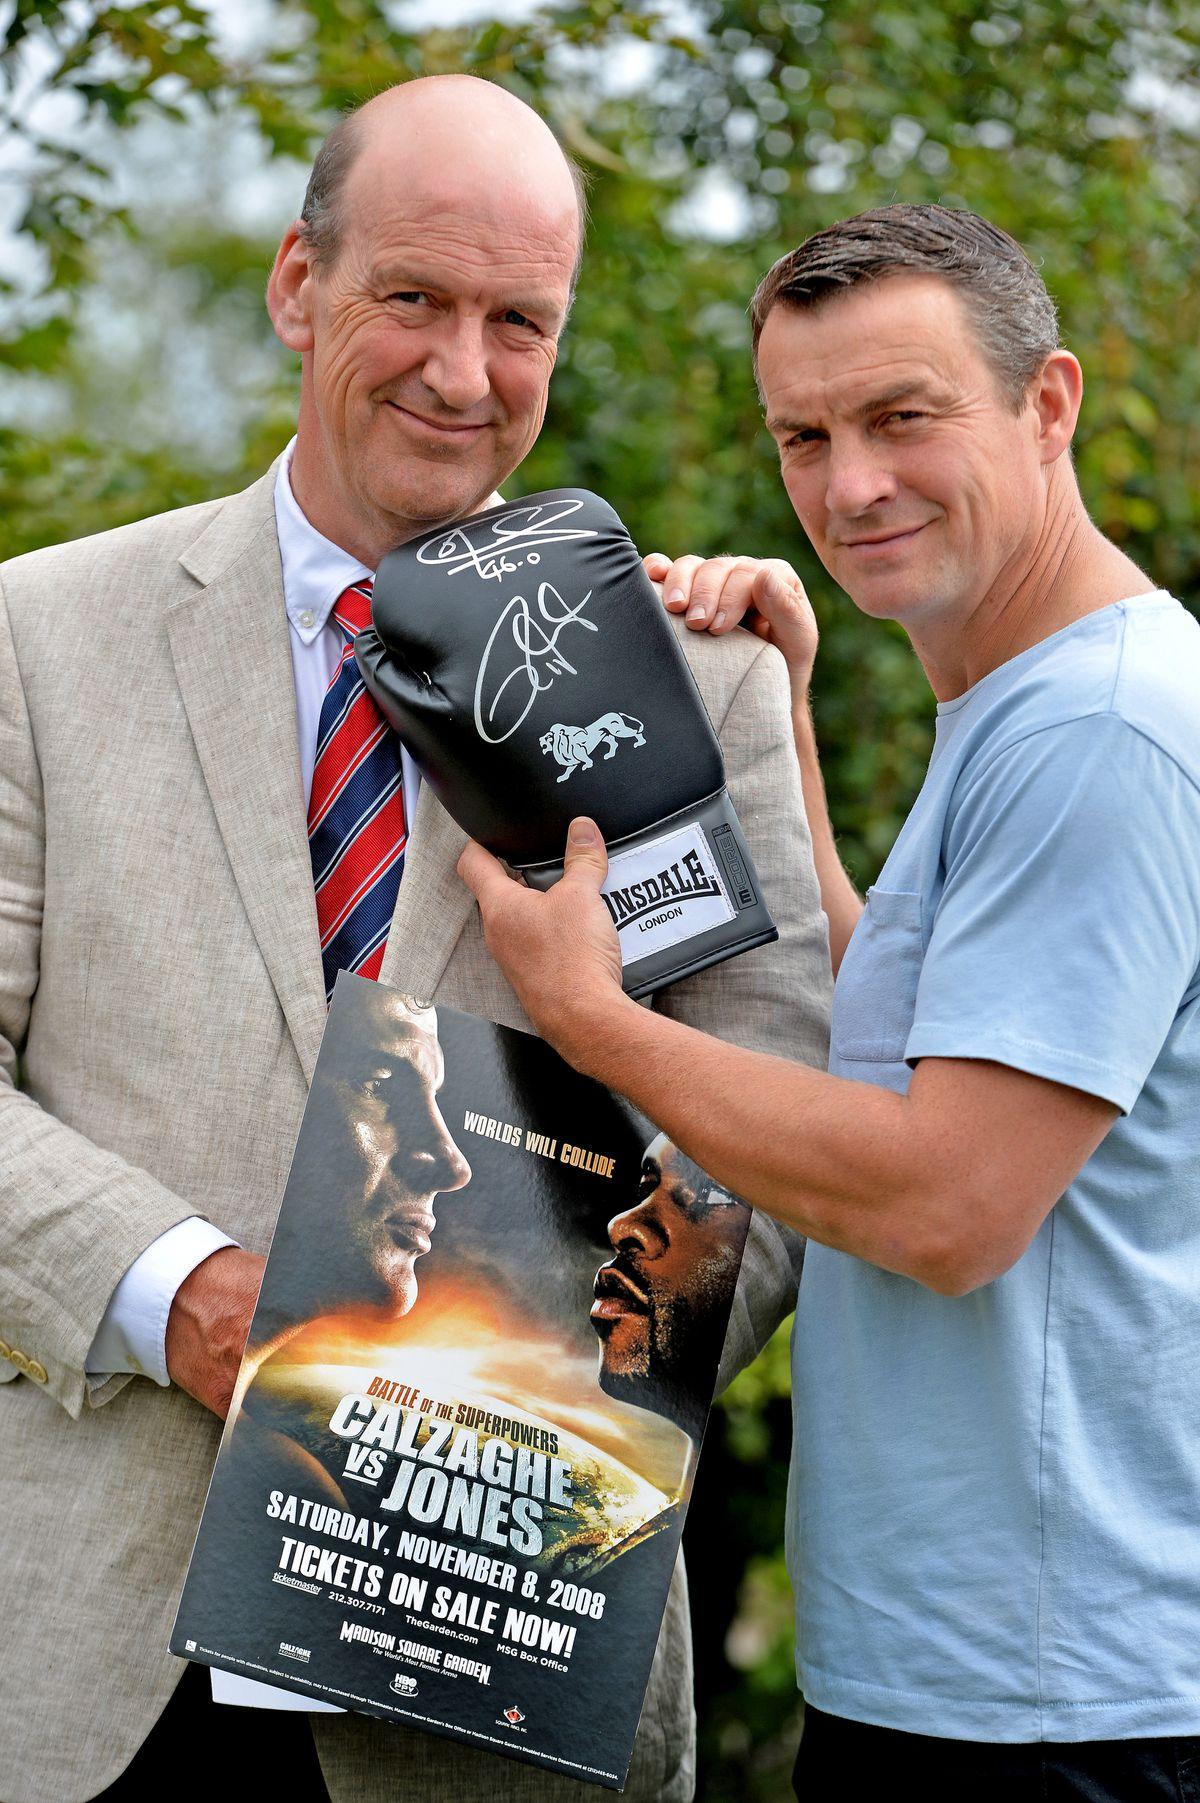 Richie with Jeremy Lamond of Halls. Halls Auctioneers, Bowmen Way, Battlefield, Shrewsbury.